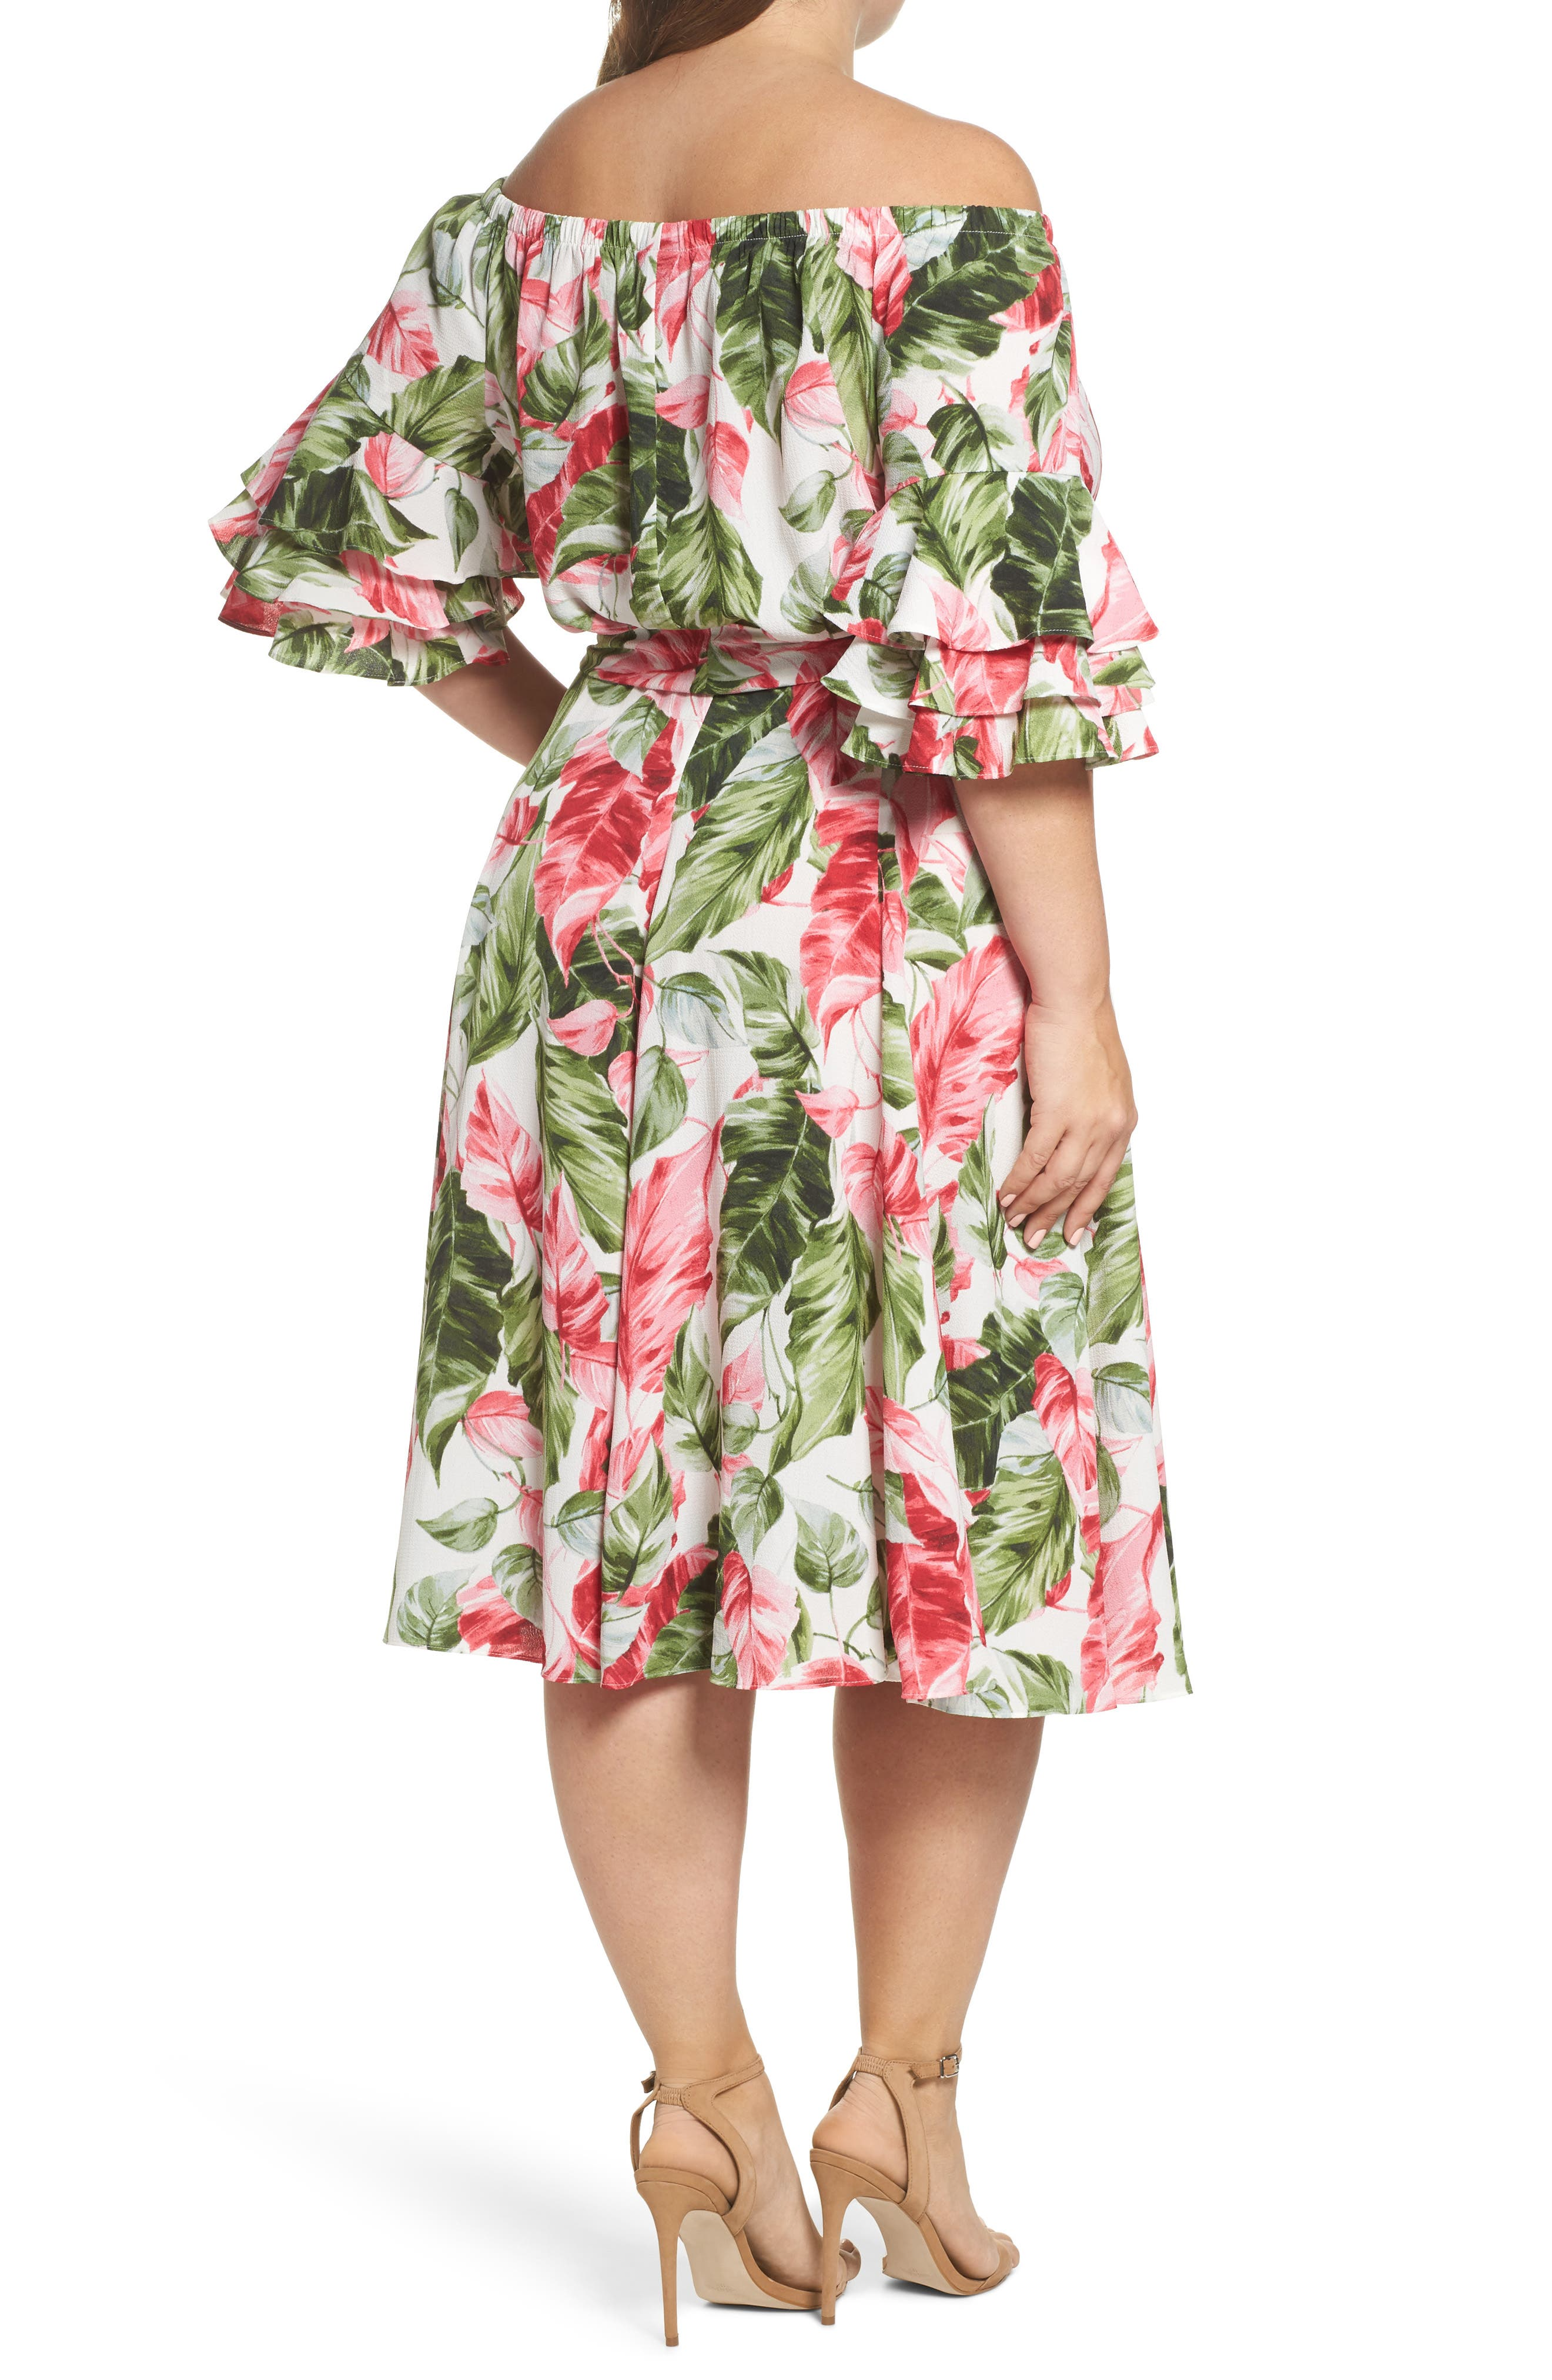 Off the Shoulder Floral Midi Dress,                             Alternate thumbnail 2, color,                             Green/ Pink